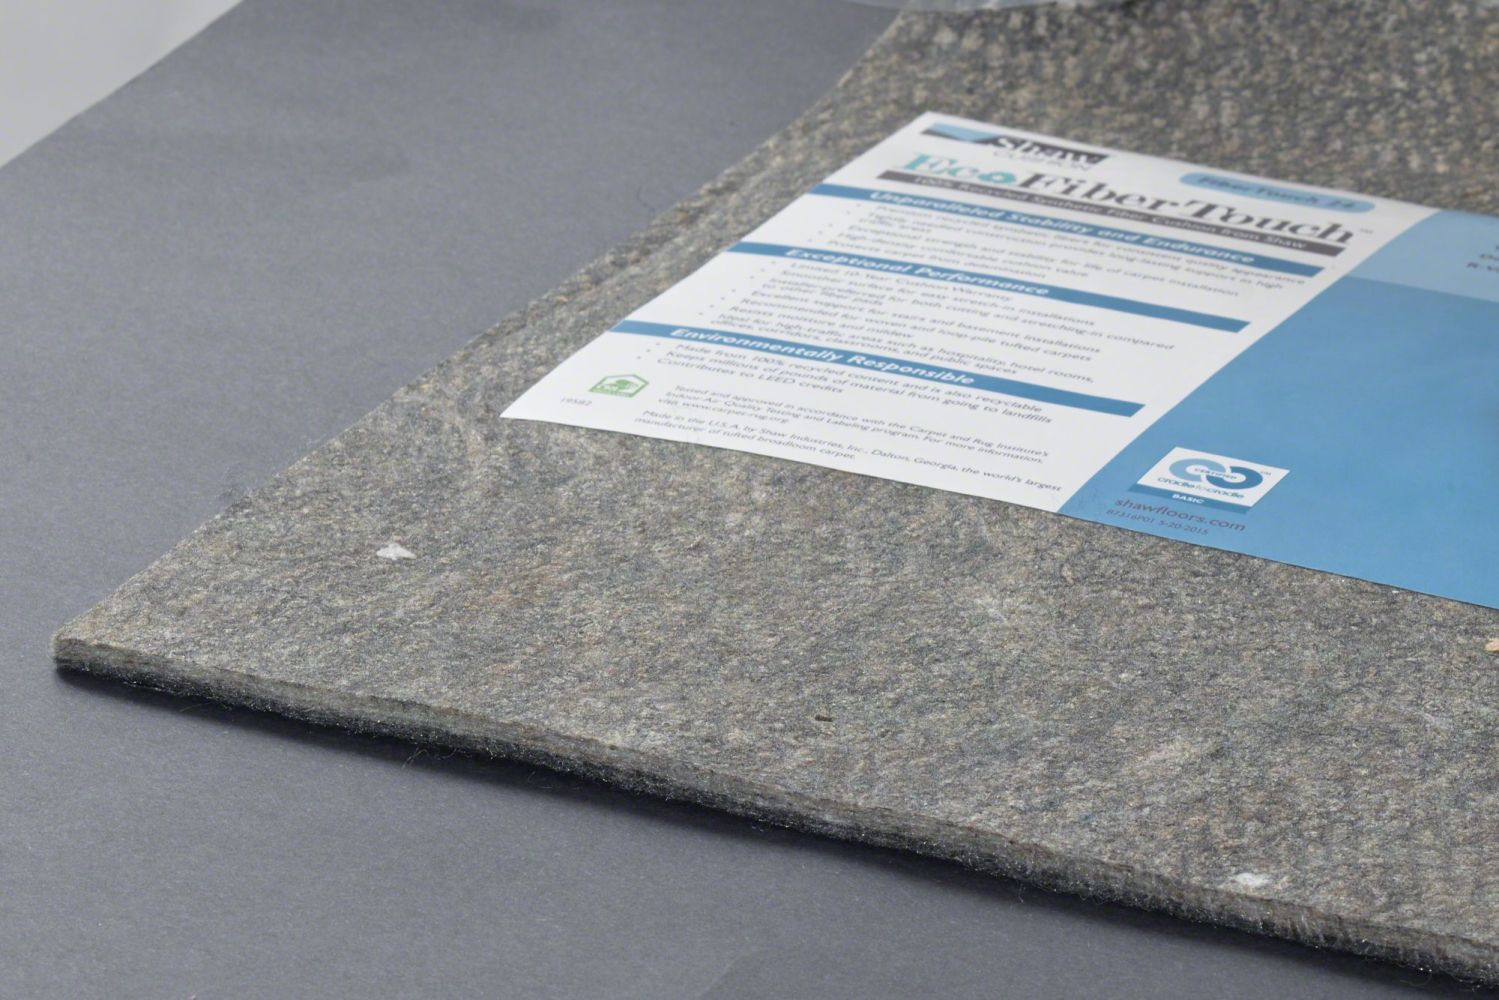 Shaw Floors Eco Edge Cushion Fibertouch 24-6 Grey 00001_240FT